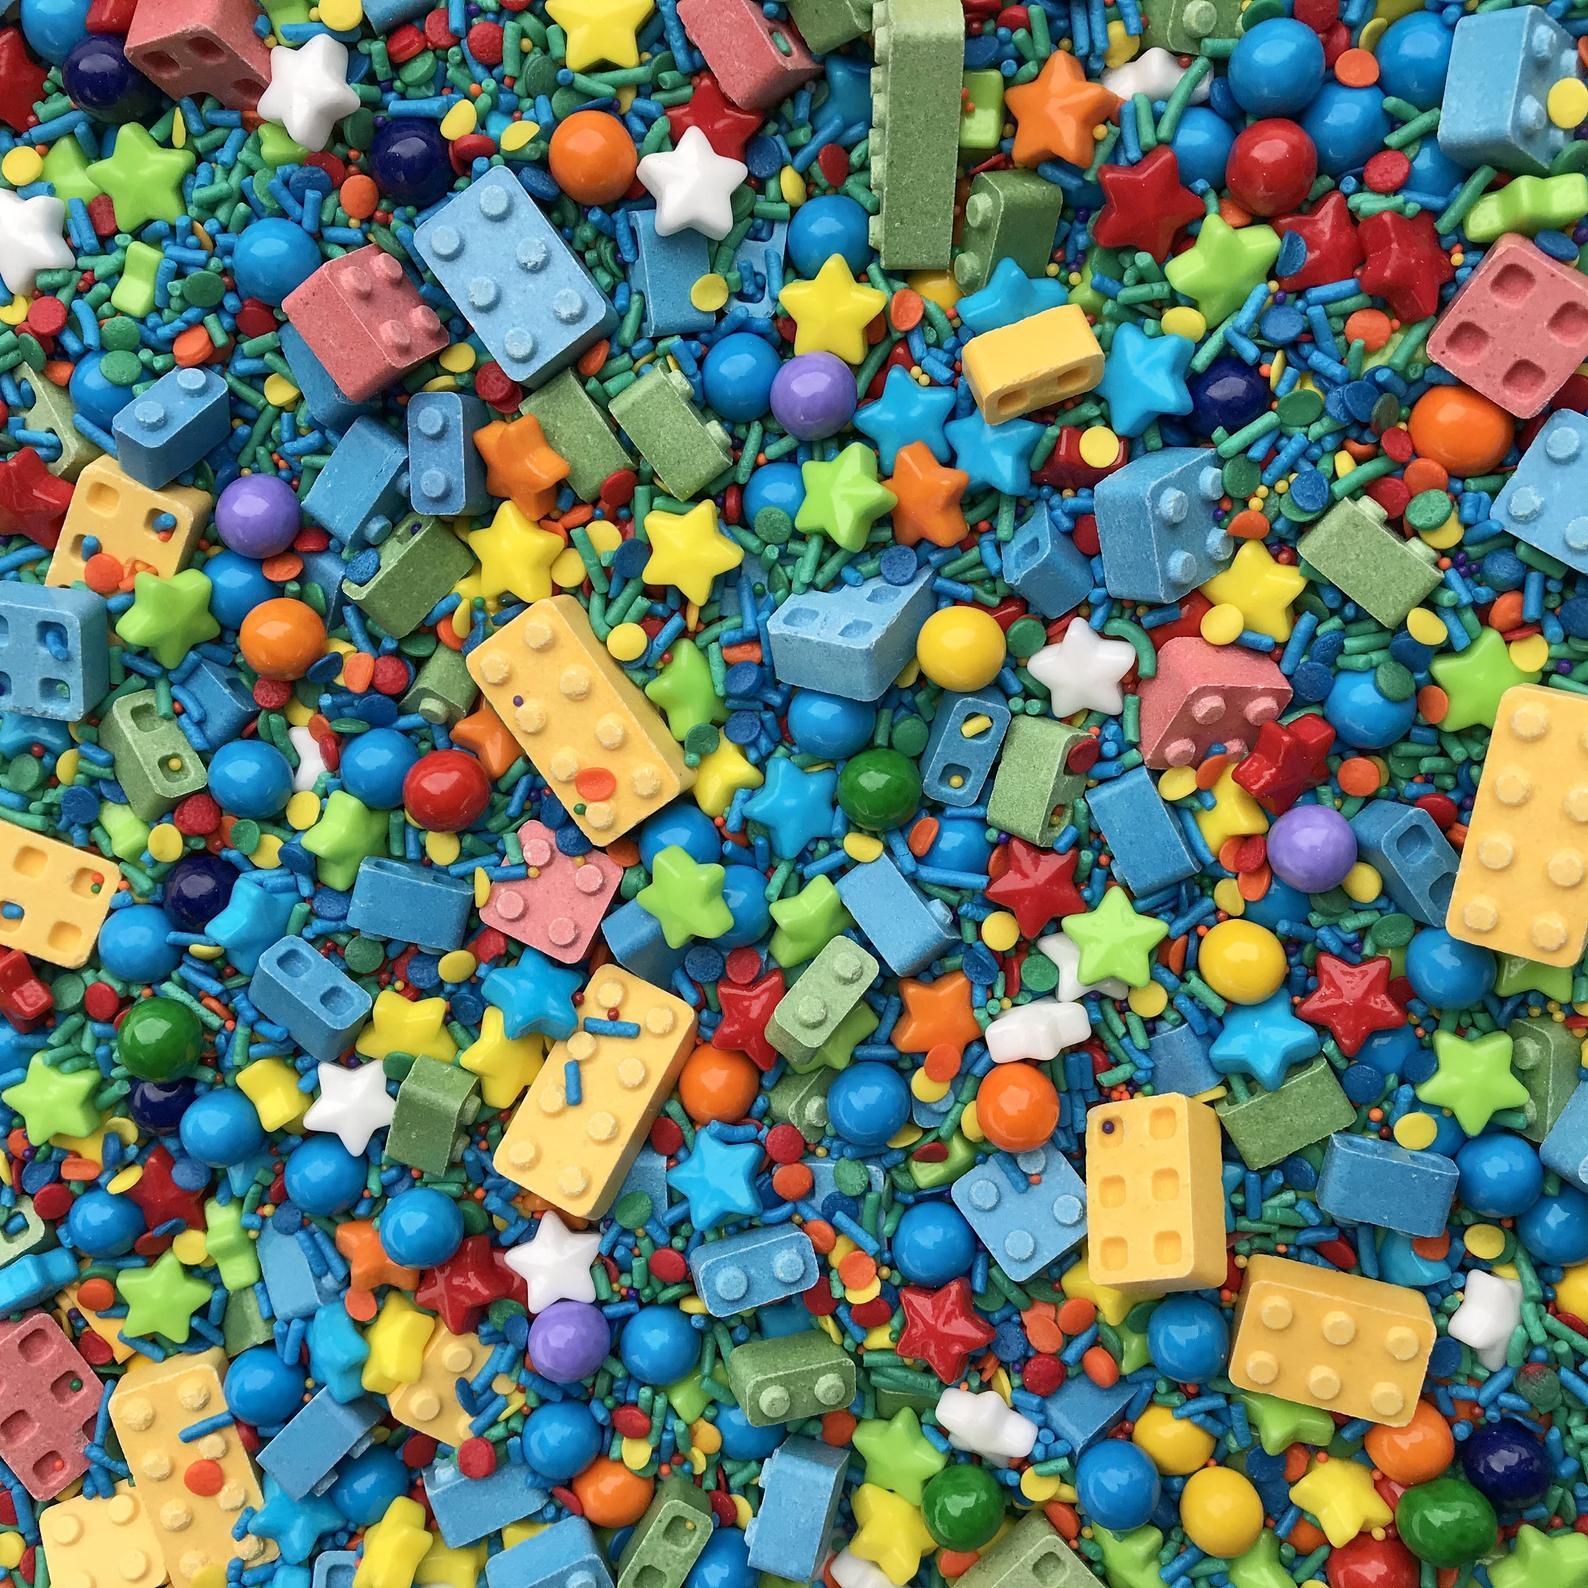 LEGO Sprinkles